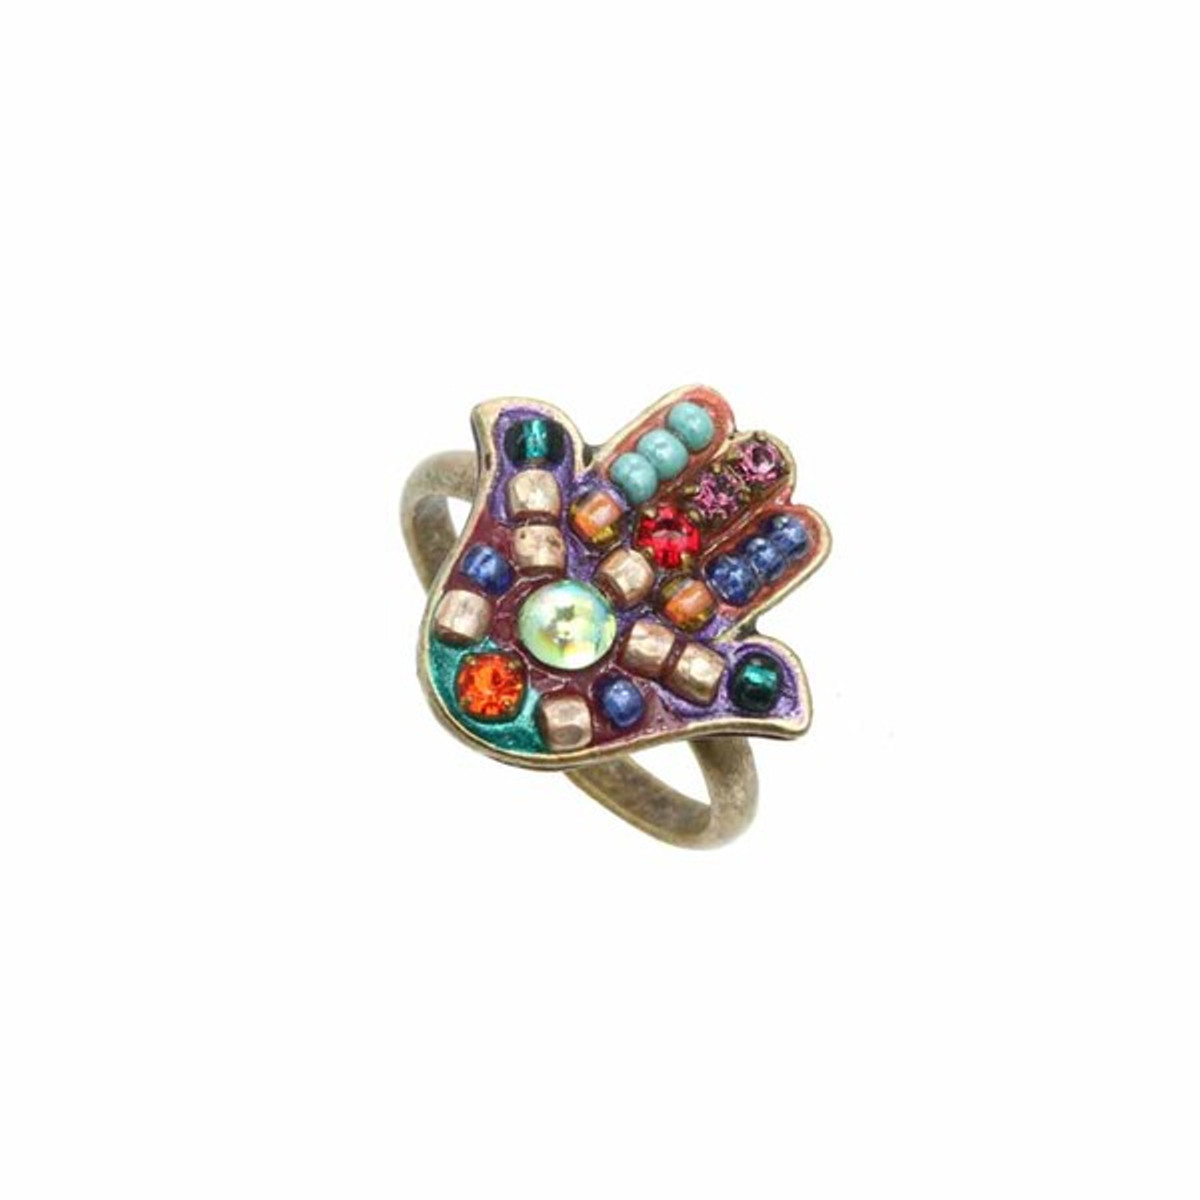 Hamsa adjustable ring from Michal Golan Jewelry